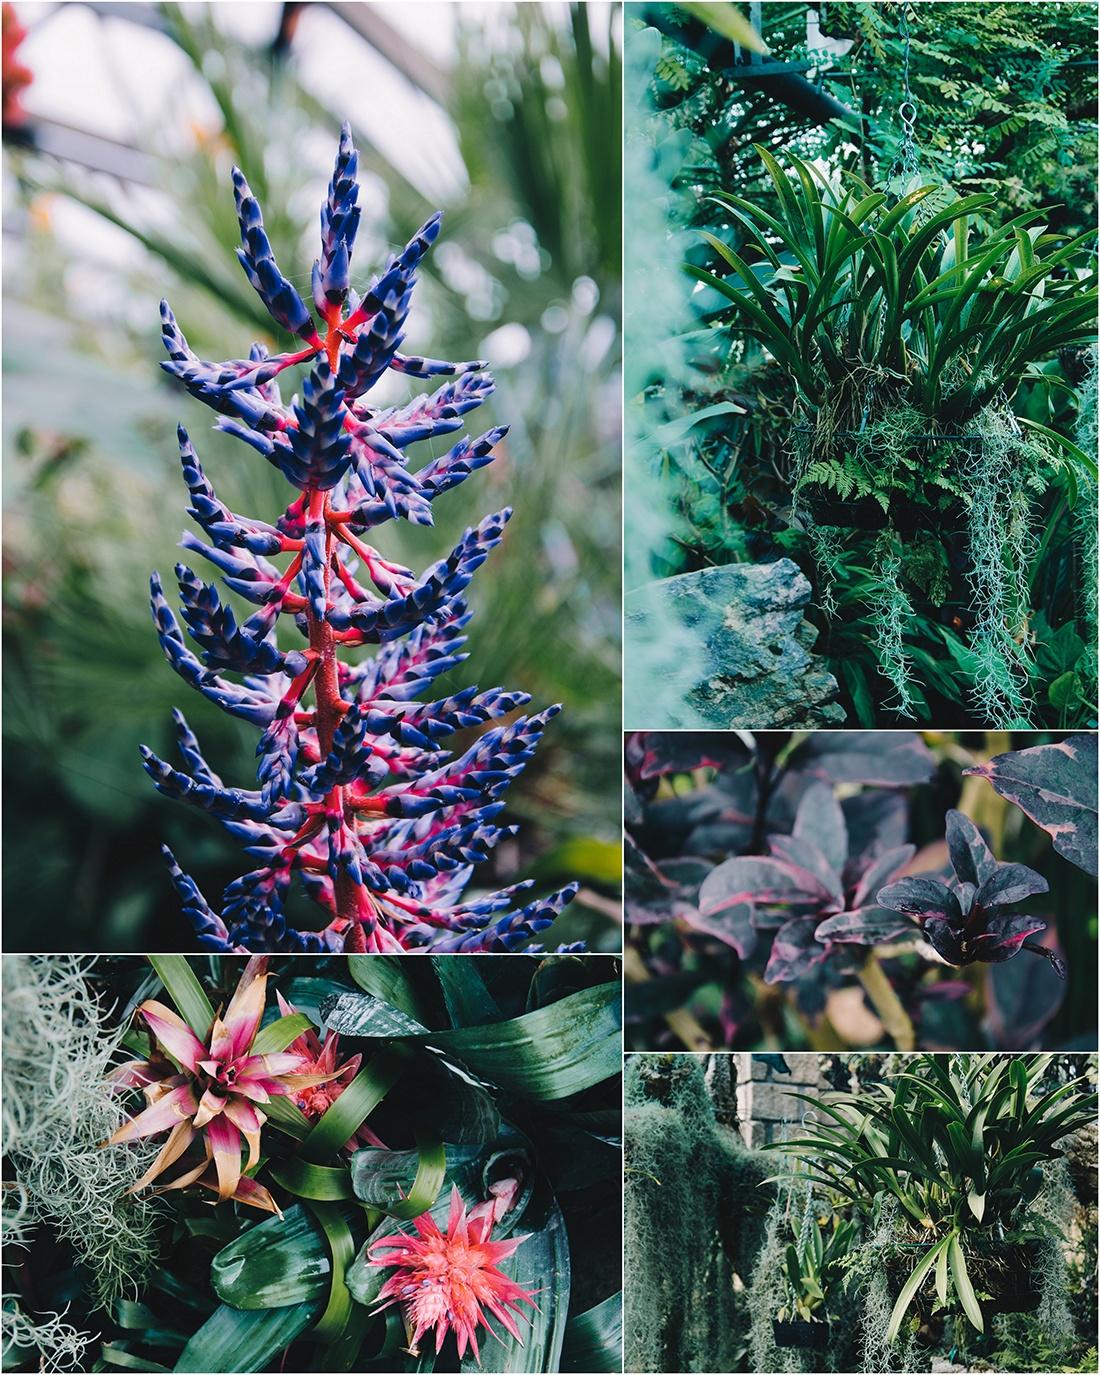 jardin botanique d'inverness, ecosse